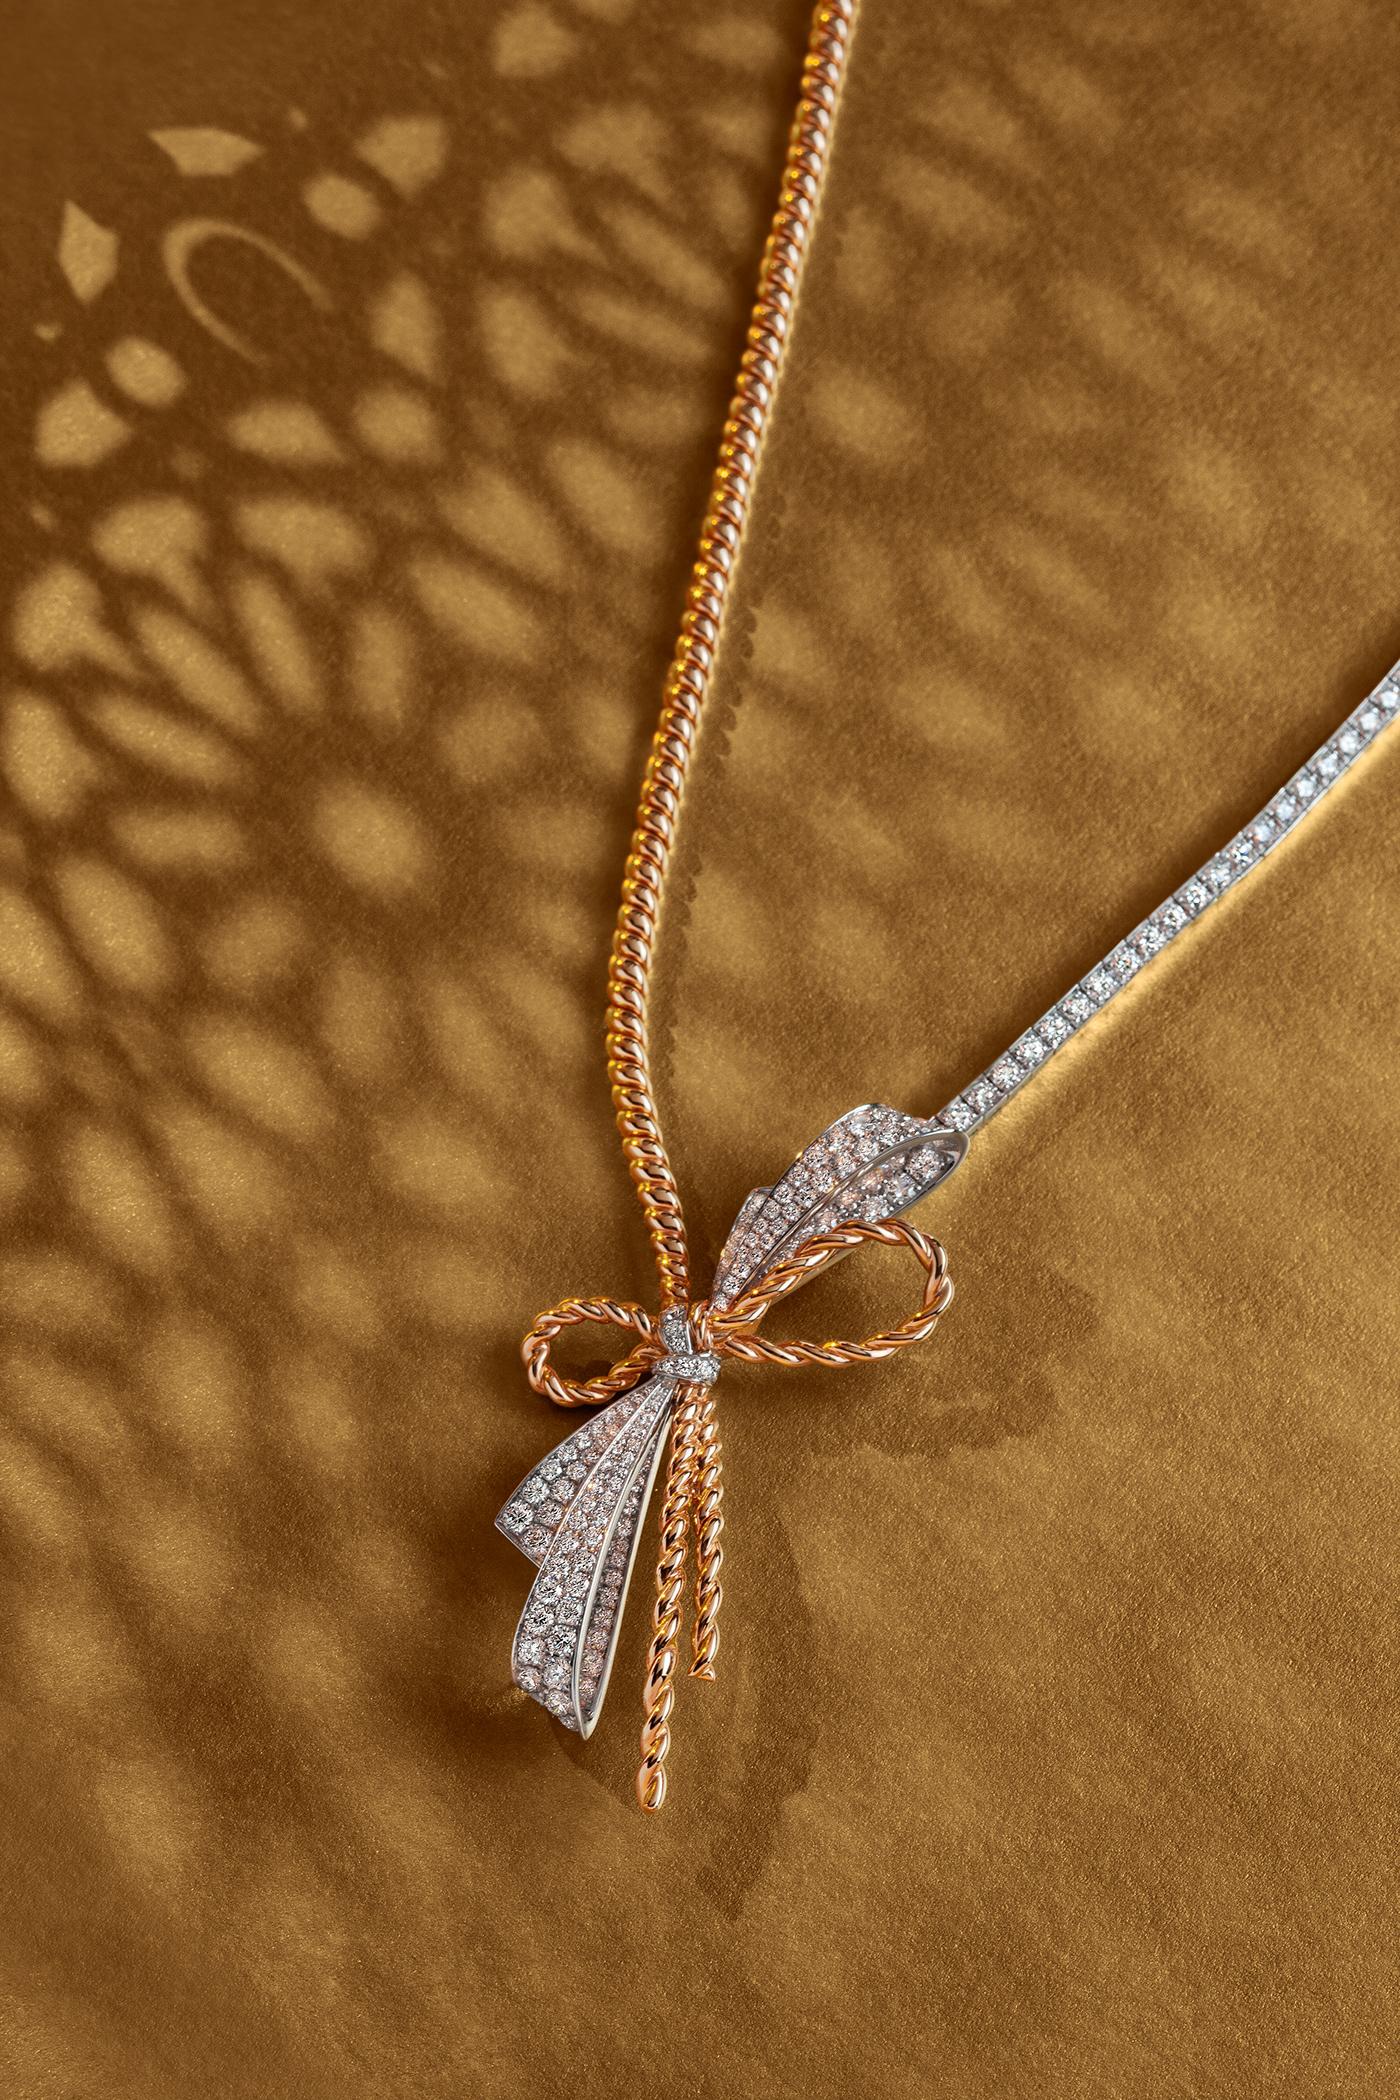 Chaumet jewelry on Behance